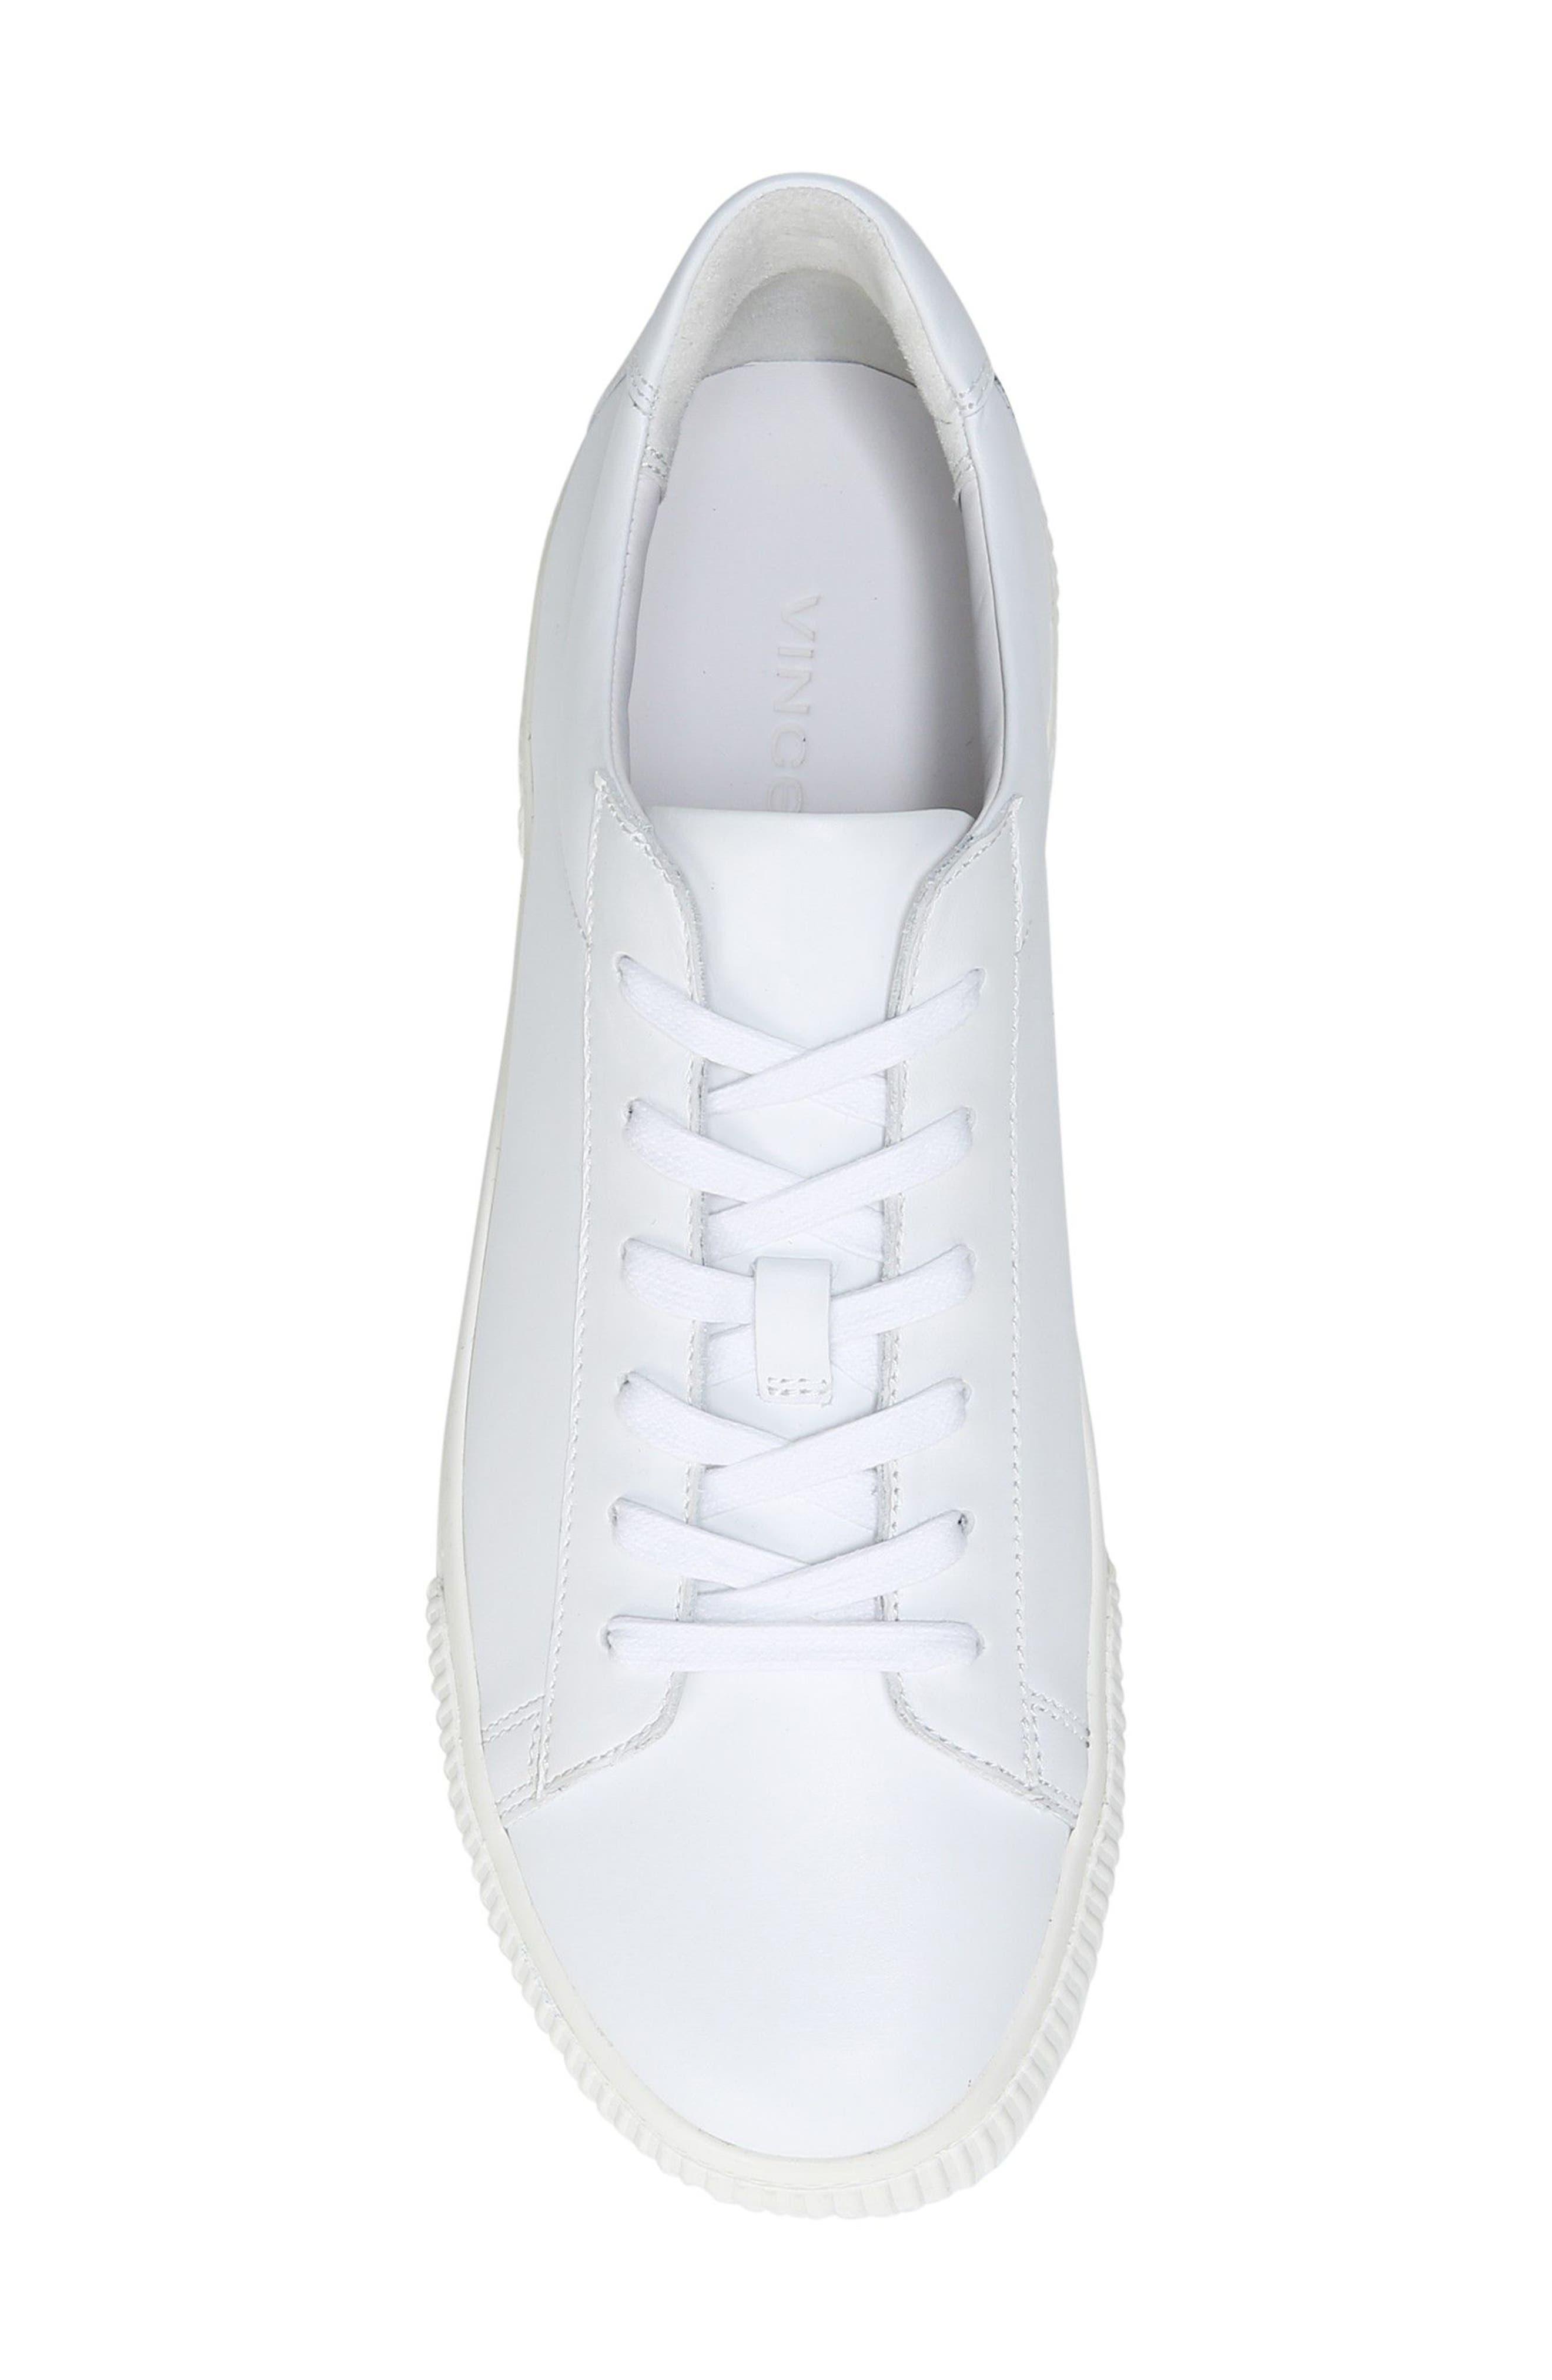 Kurtis Low Top Sneaker,                             Alternate thumbnail 5, color,                             White